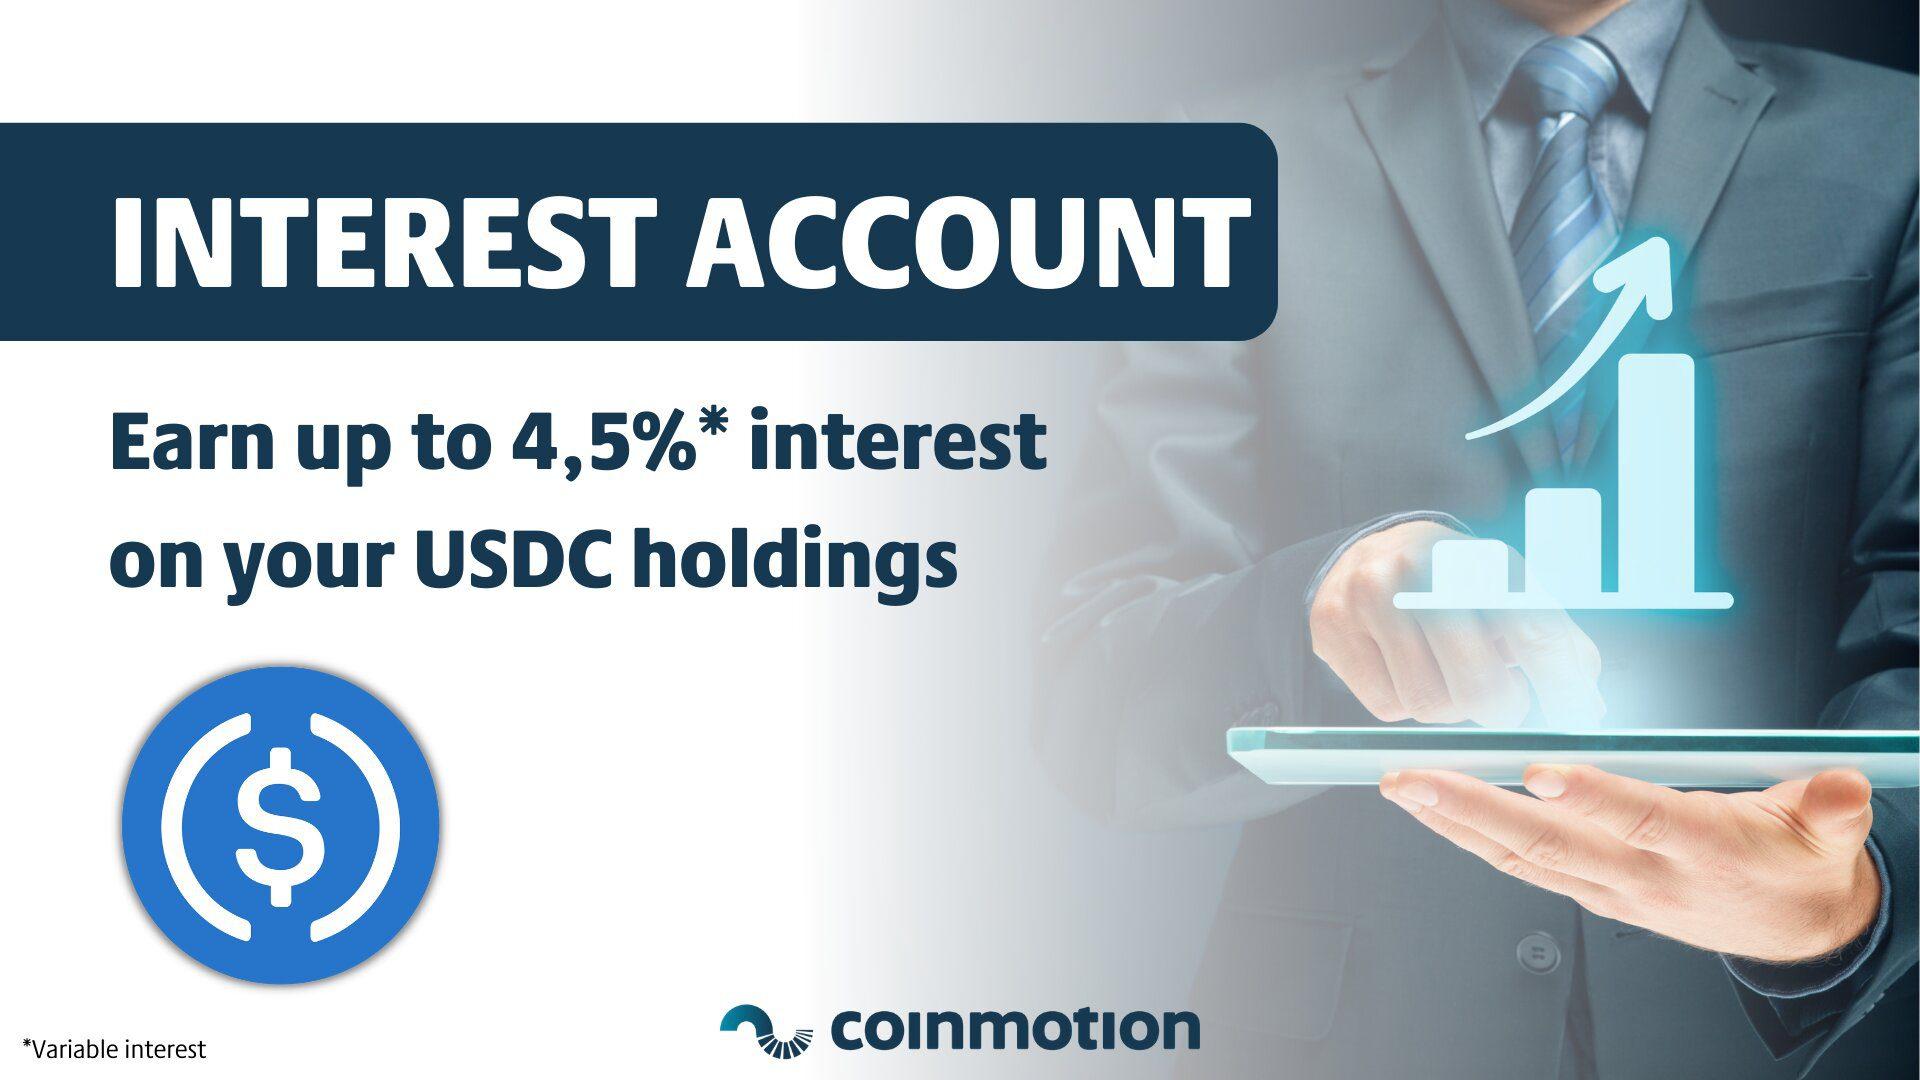 usdc-interest-account